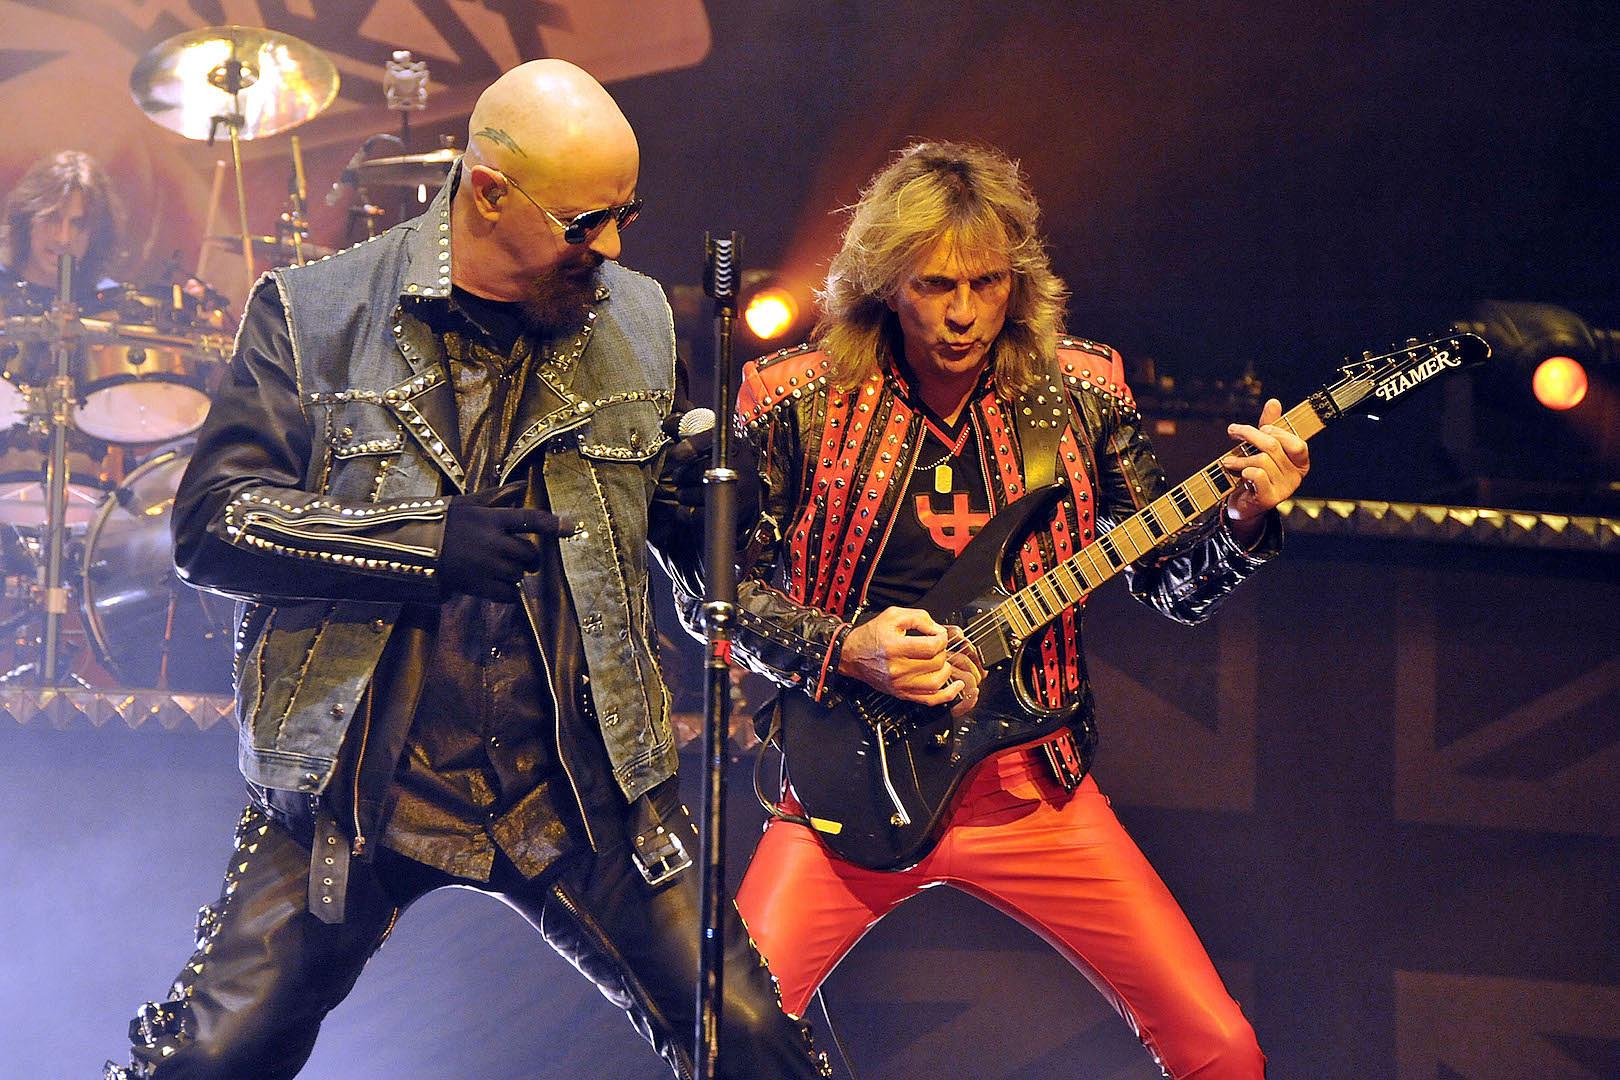 Judas Priest's Glenn Tipton Is Working on Riffs for New Album